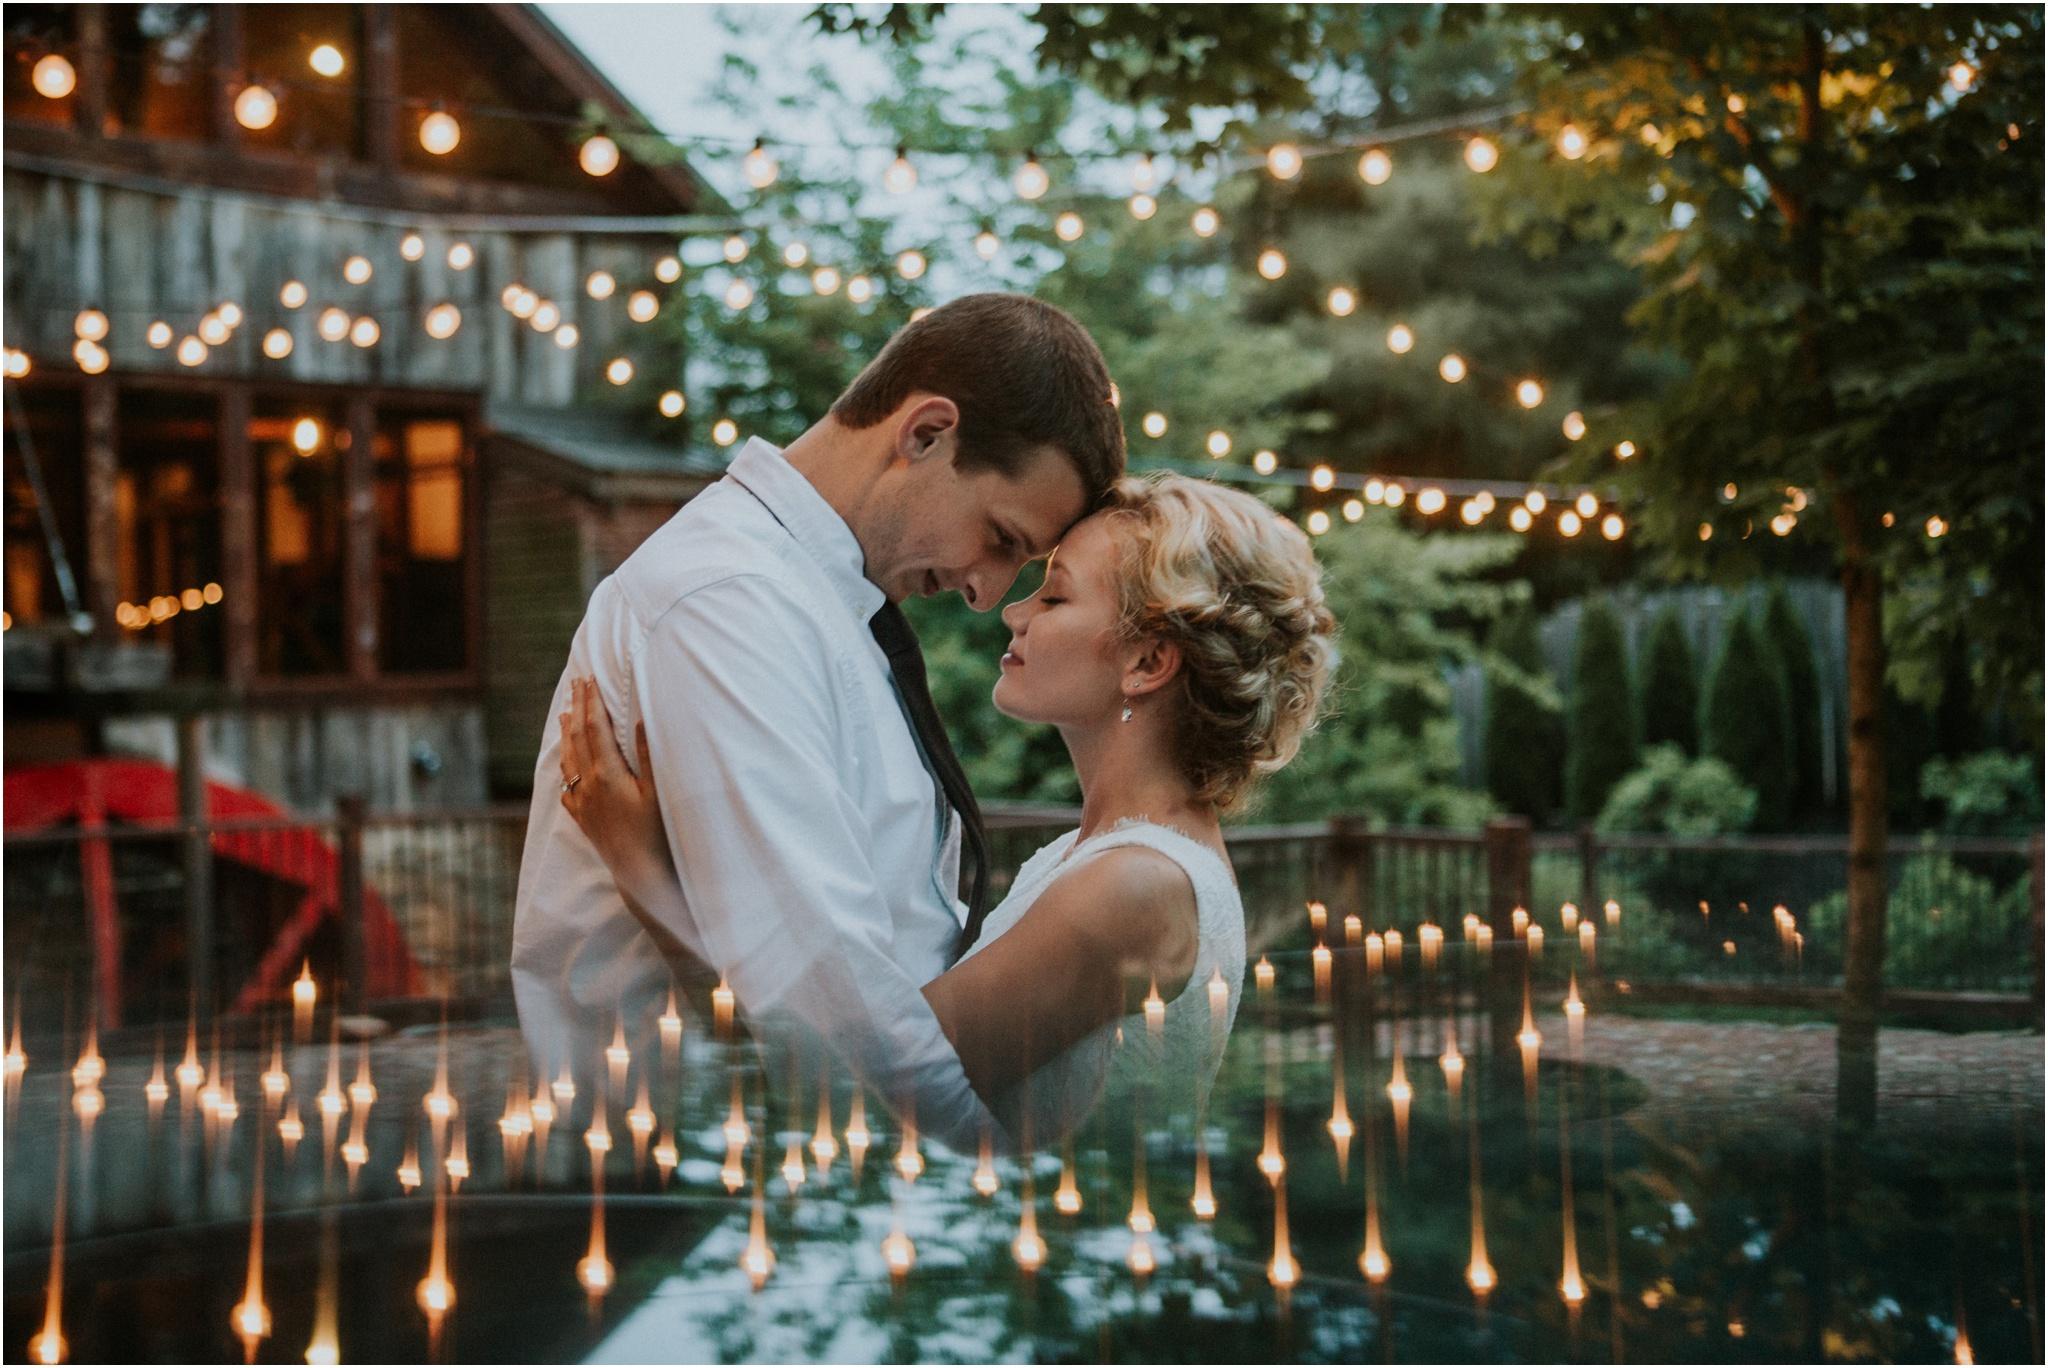 the-millstone-limestone-rustic-intimate-outdoors-backyard-wedding-wildflowers-tennessee_0111.jpg